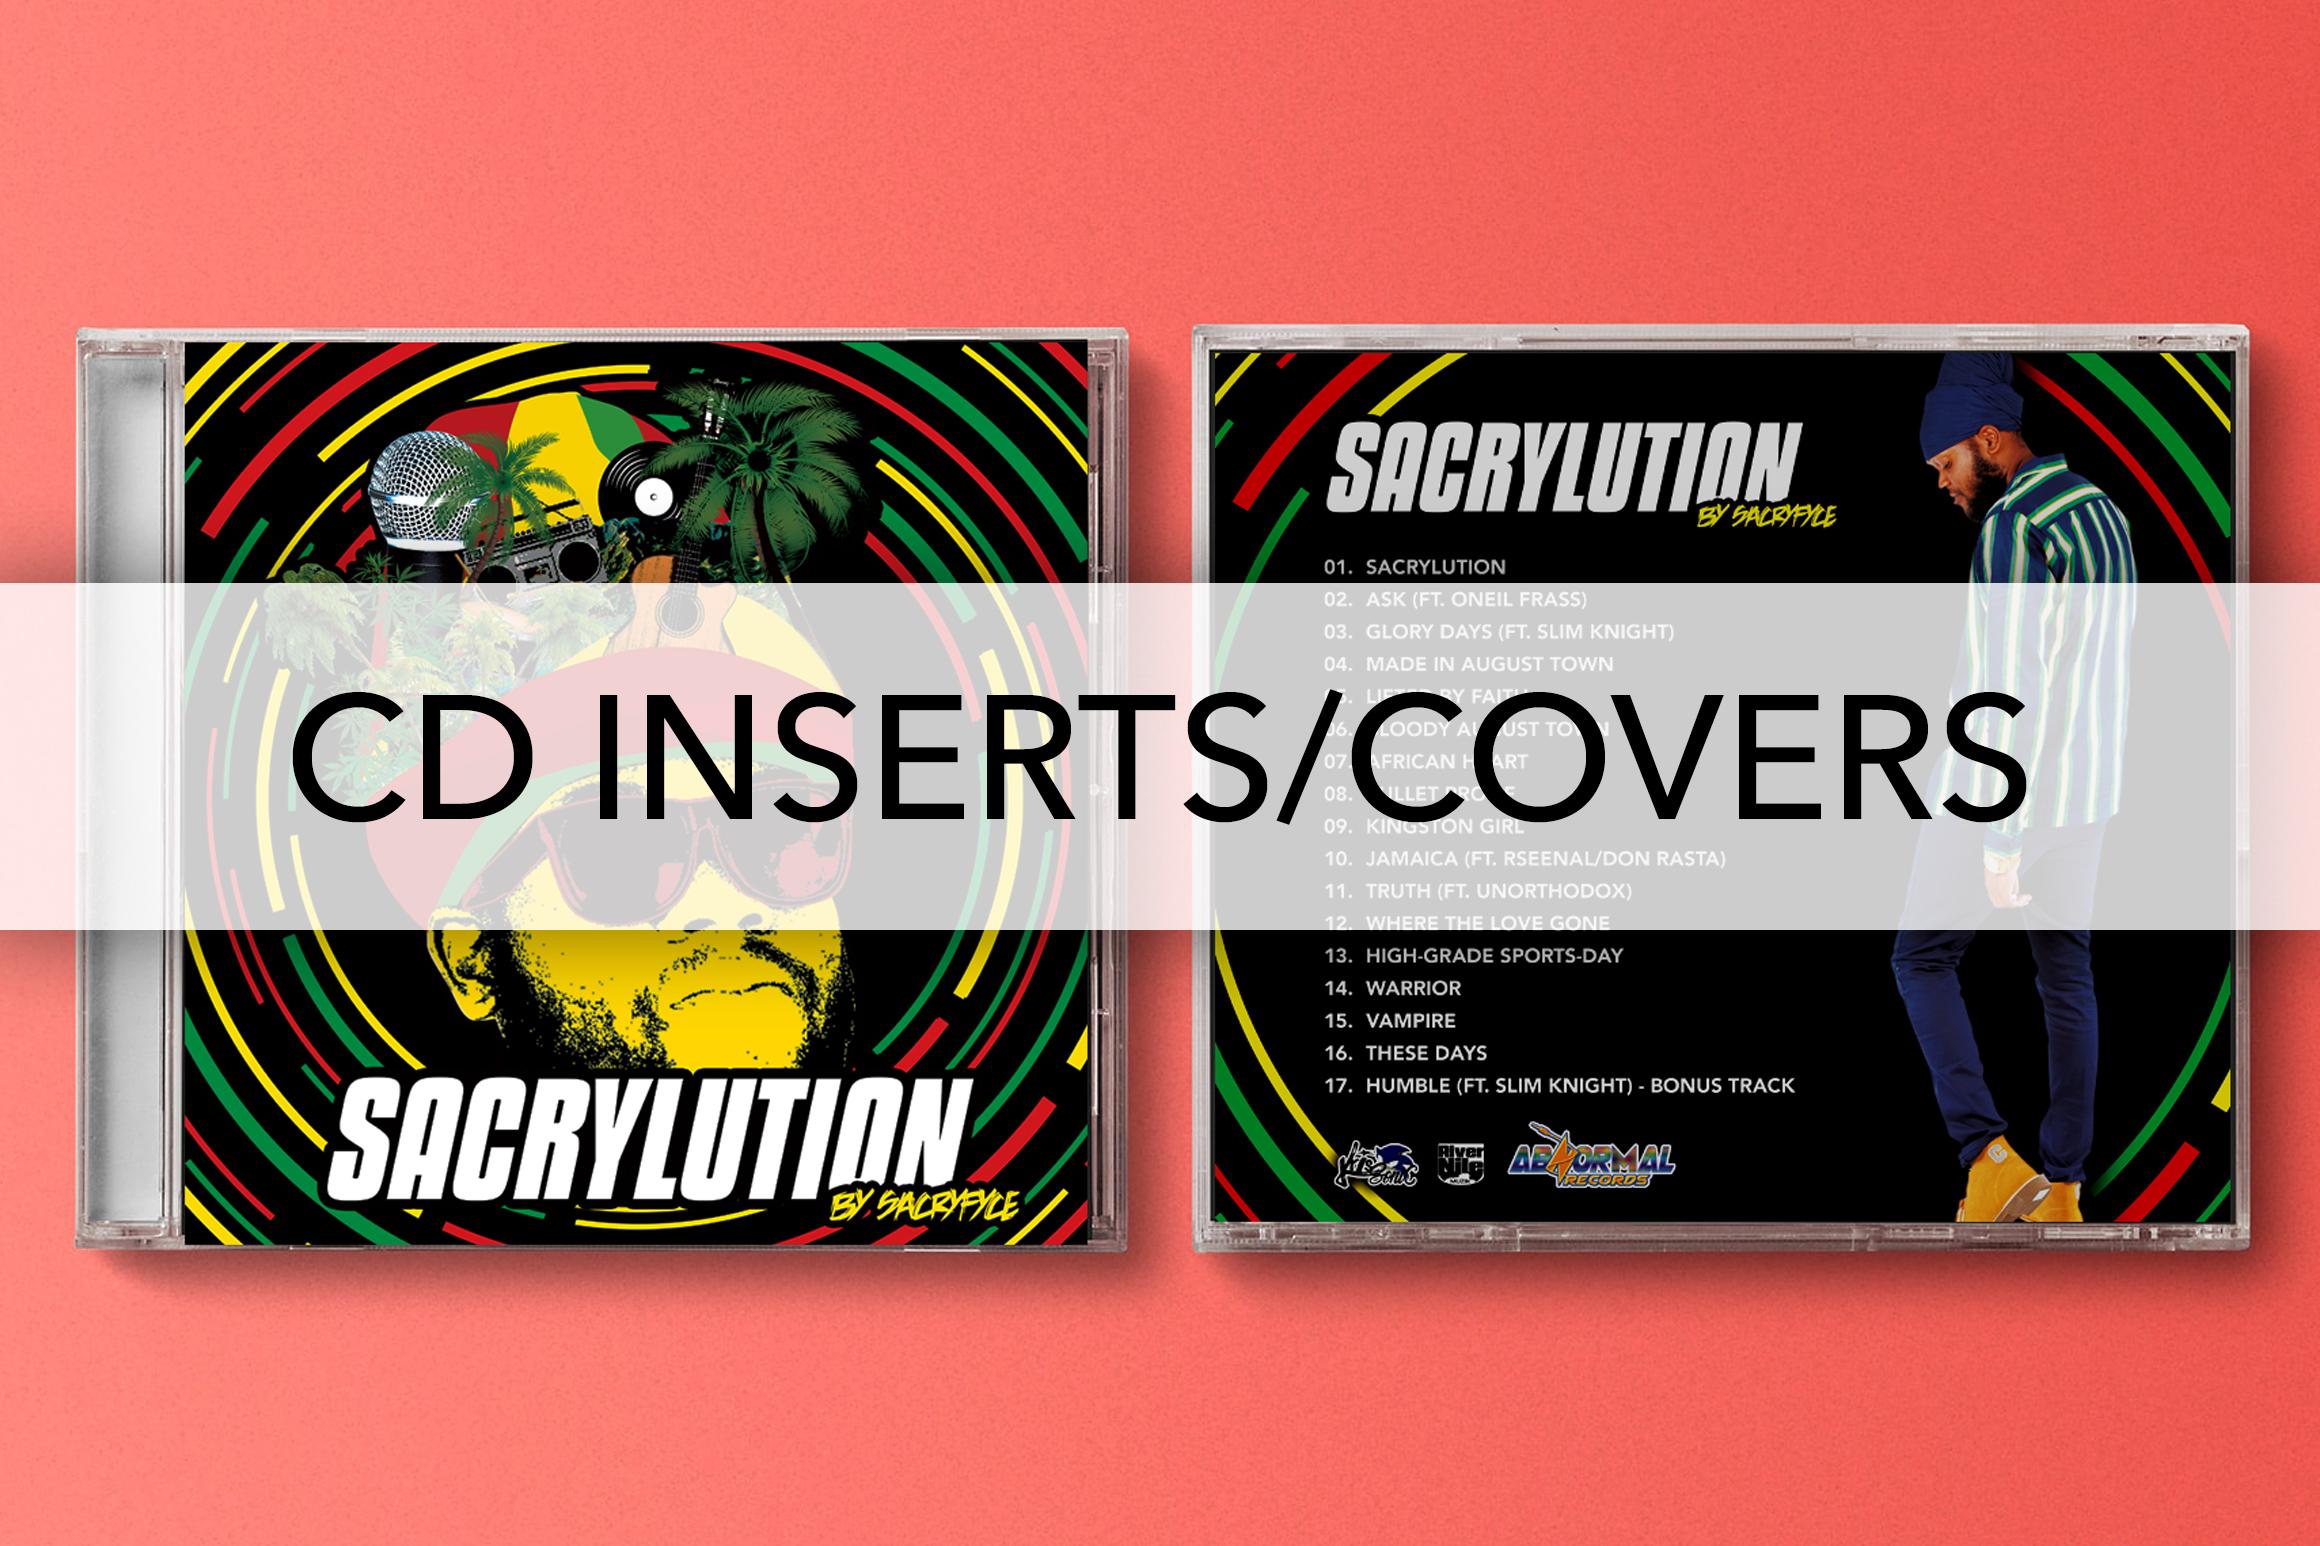 NYO CD COVER DESIGNS